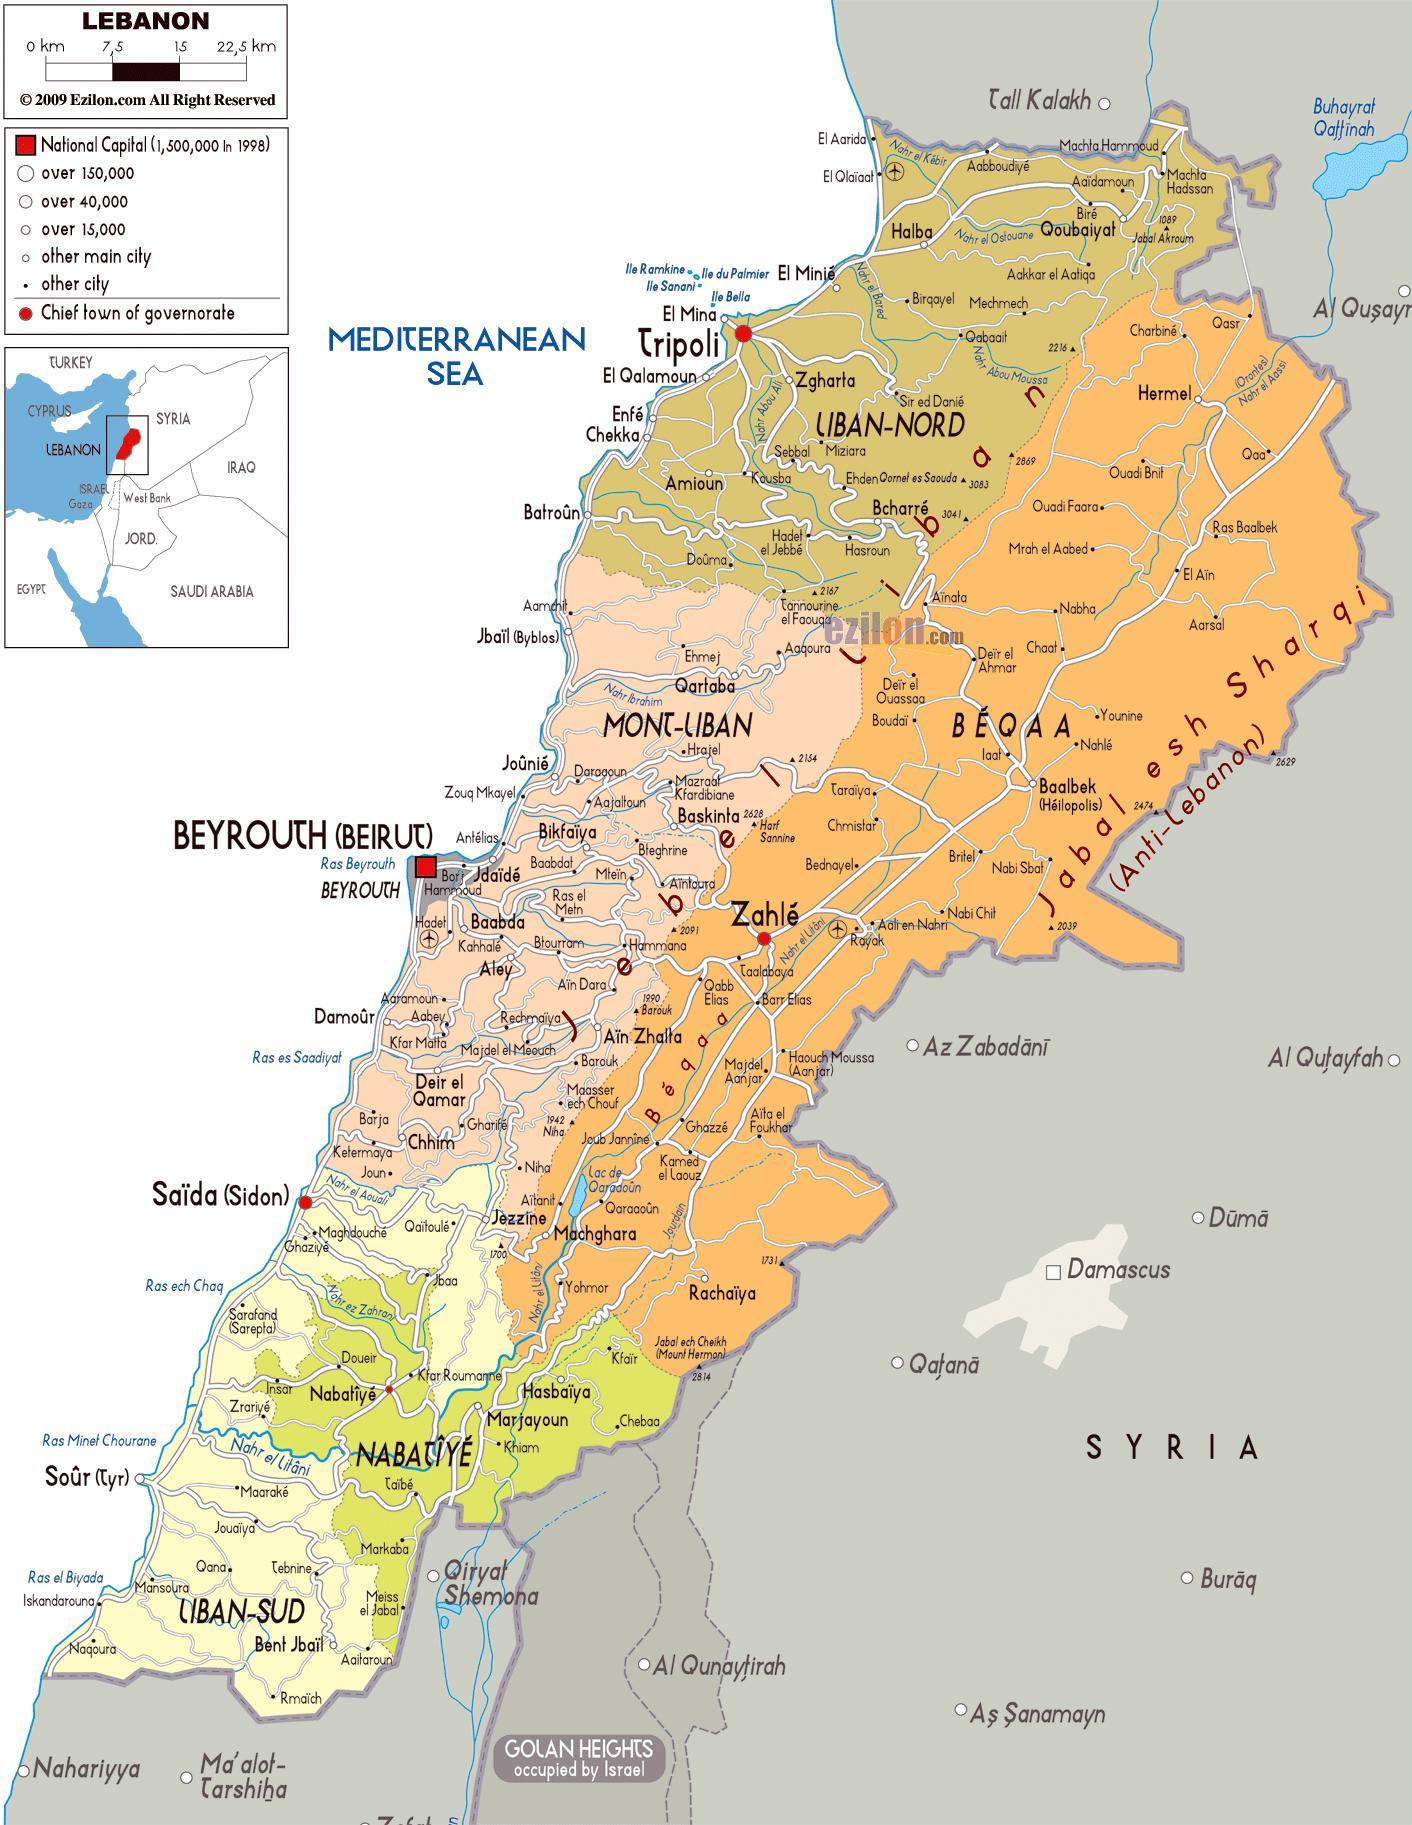 Lebanon cities map lebanon map detailed western asia asia lebanon map detailed altavistaventures Images